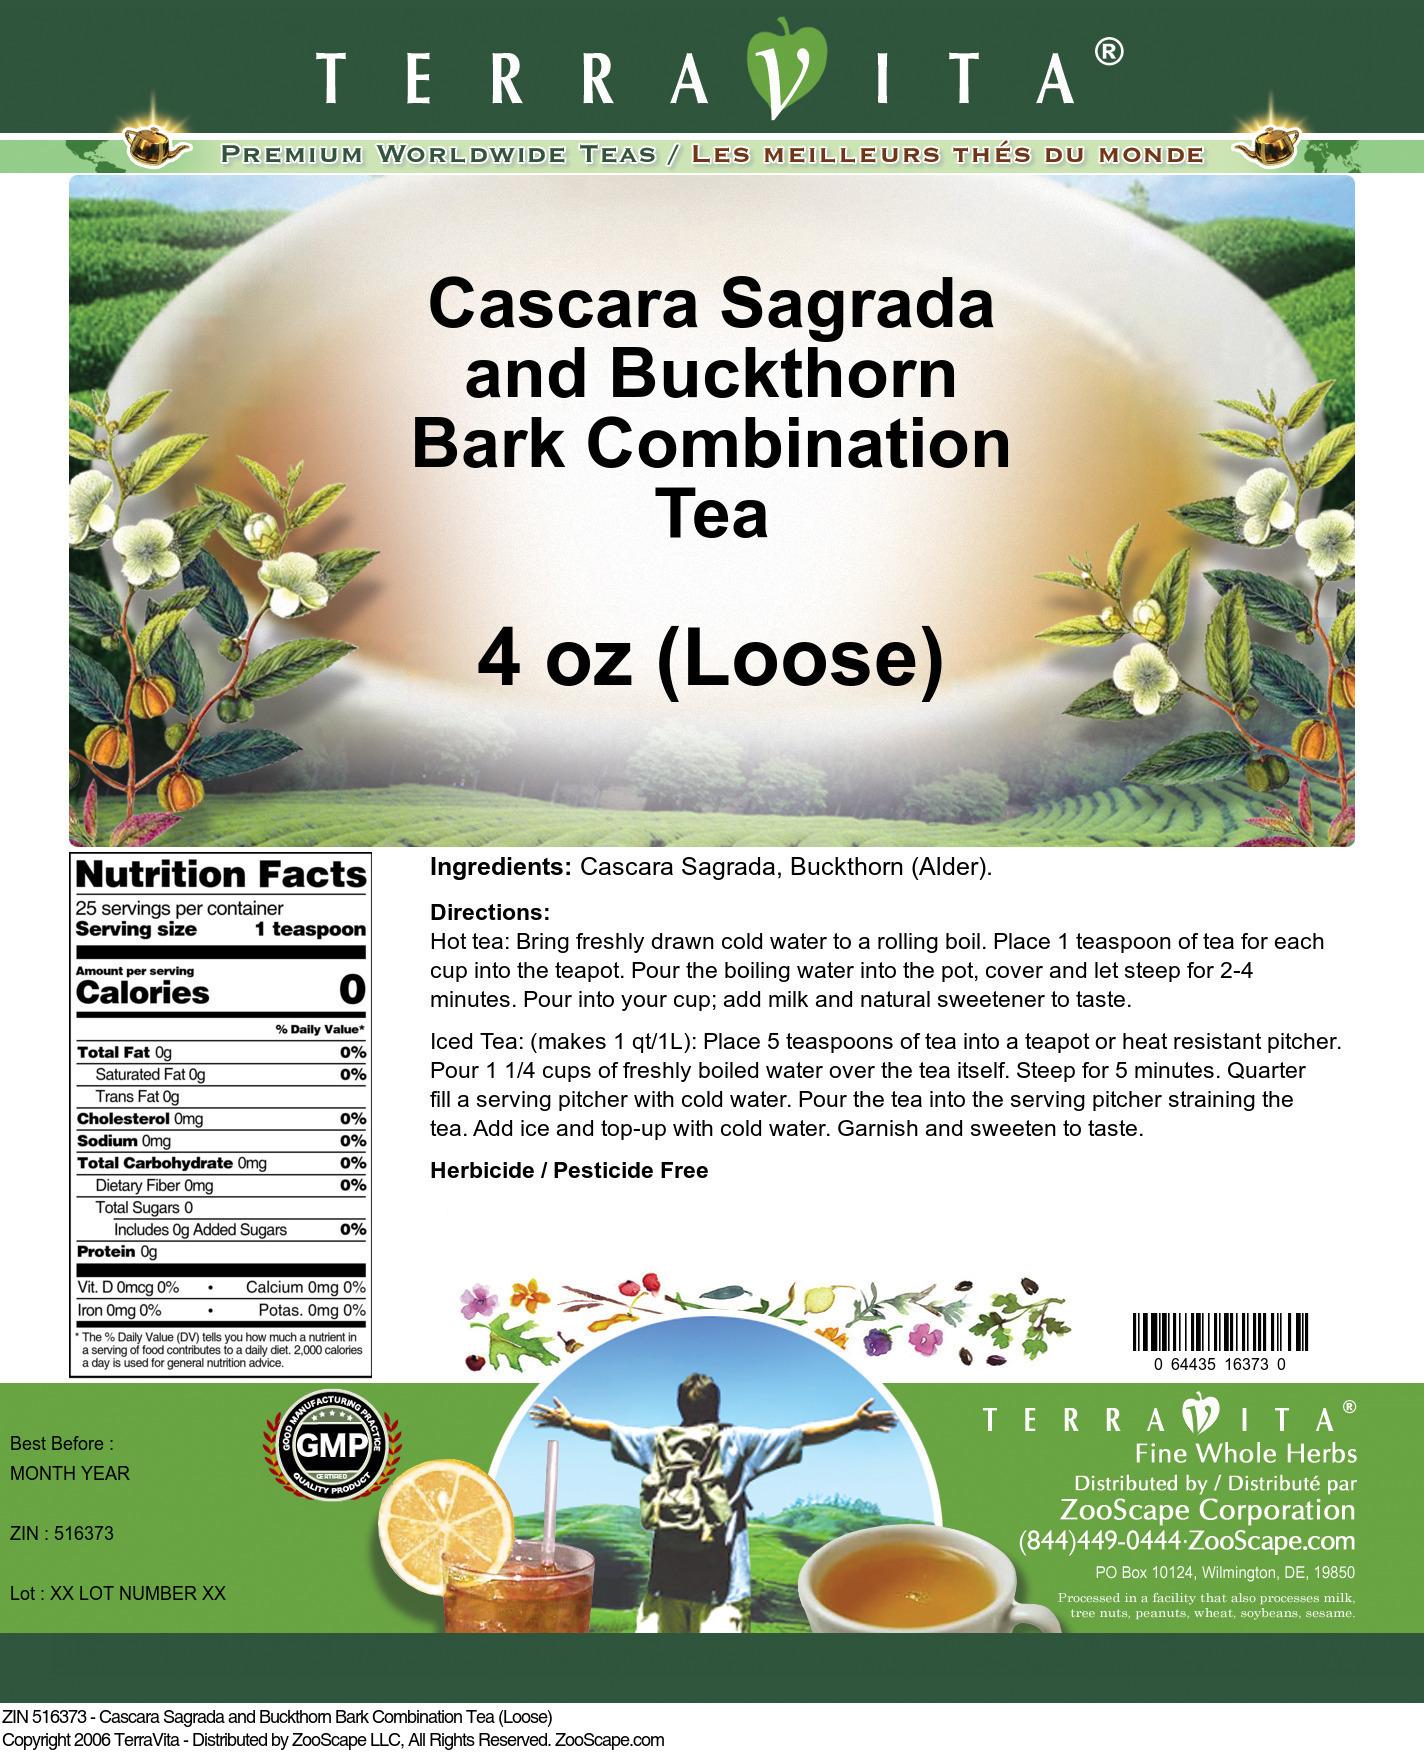 Cascara Sagrada and Buckthorn Bark Combination Tea (Loose)